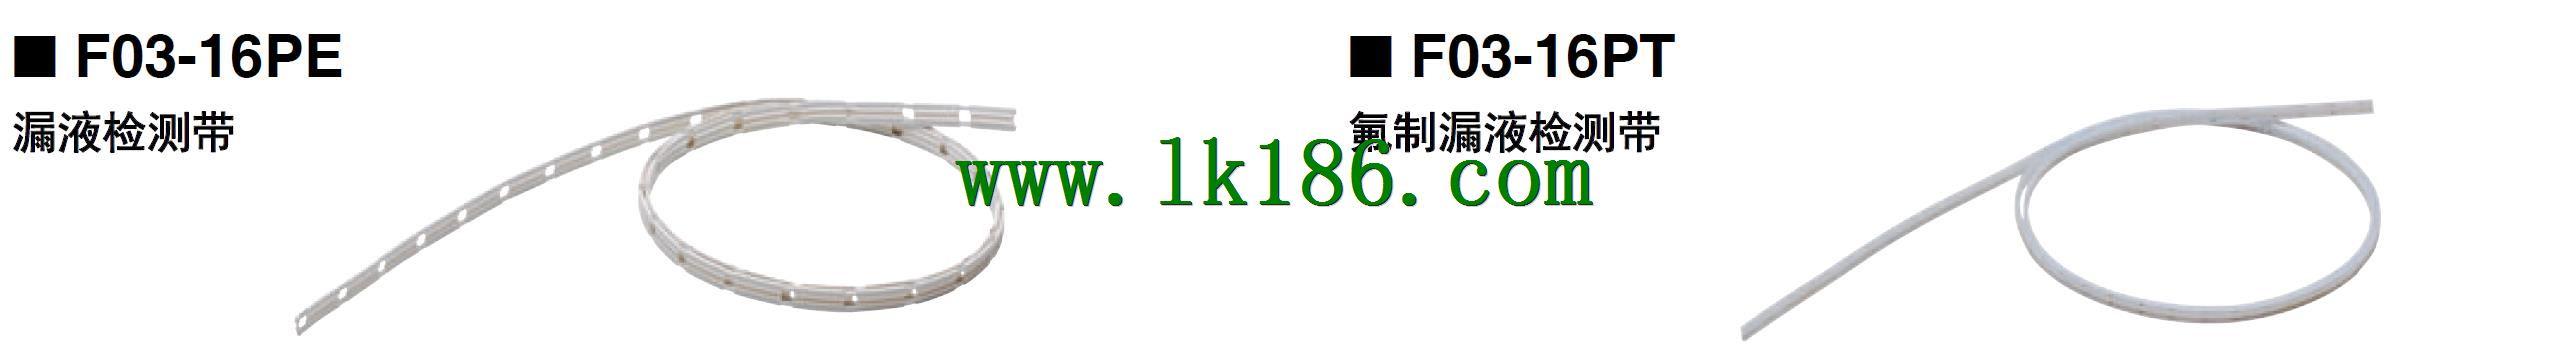 F03 26ptn Remarks 10 Stickers Per Set Omron F03 26ptn